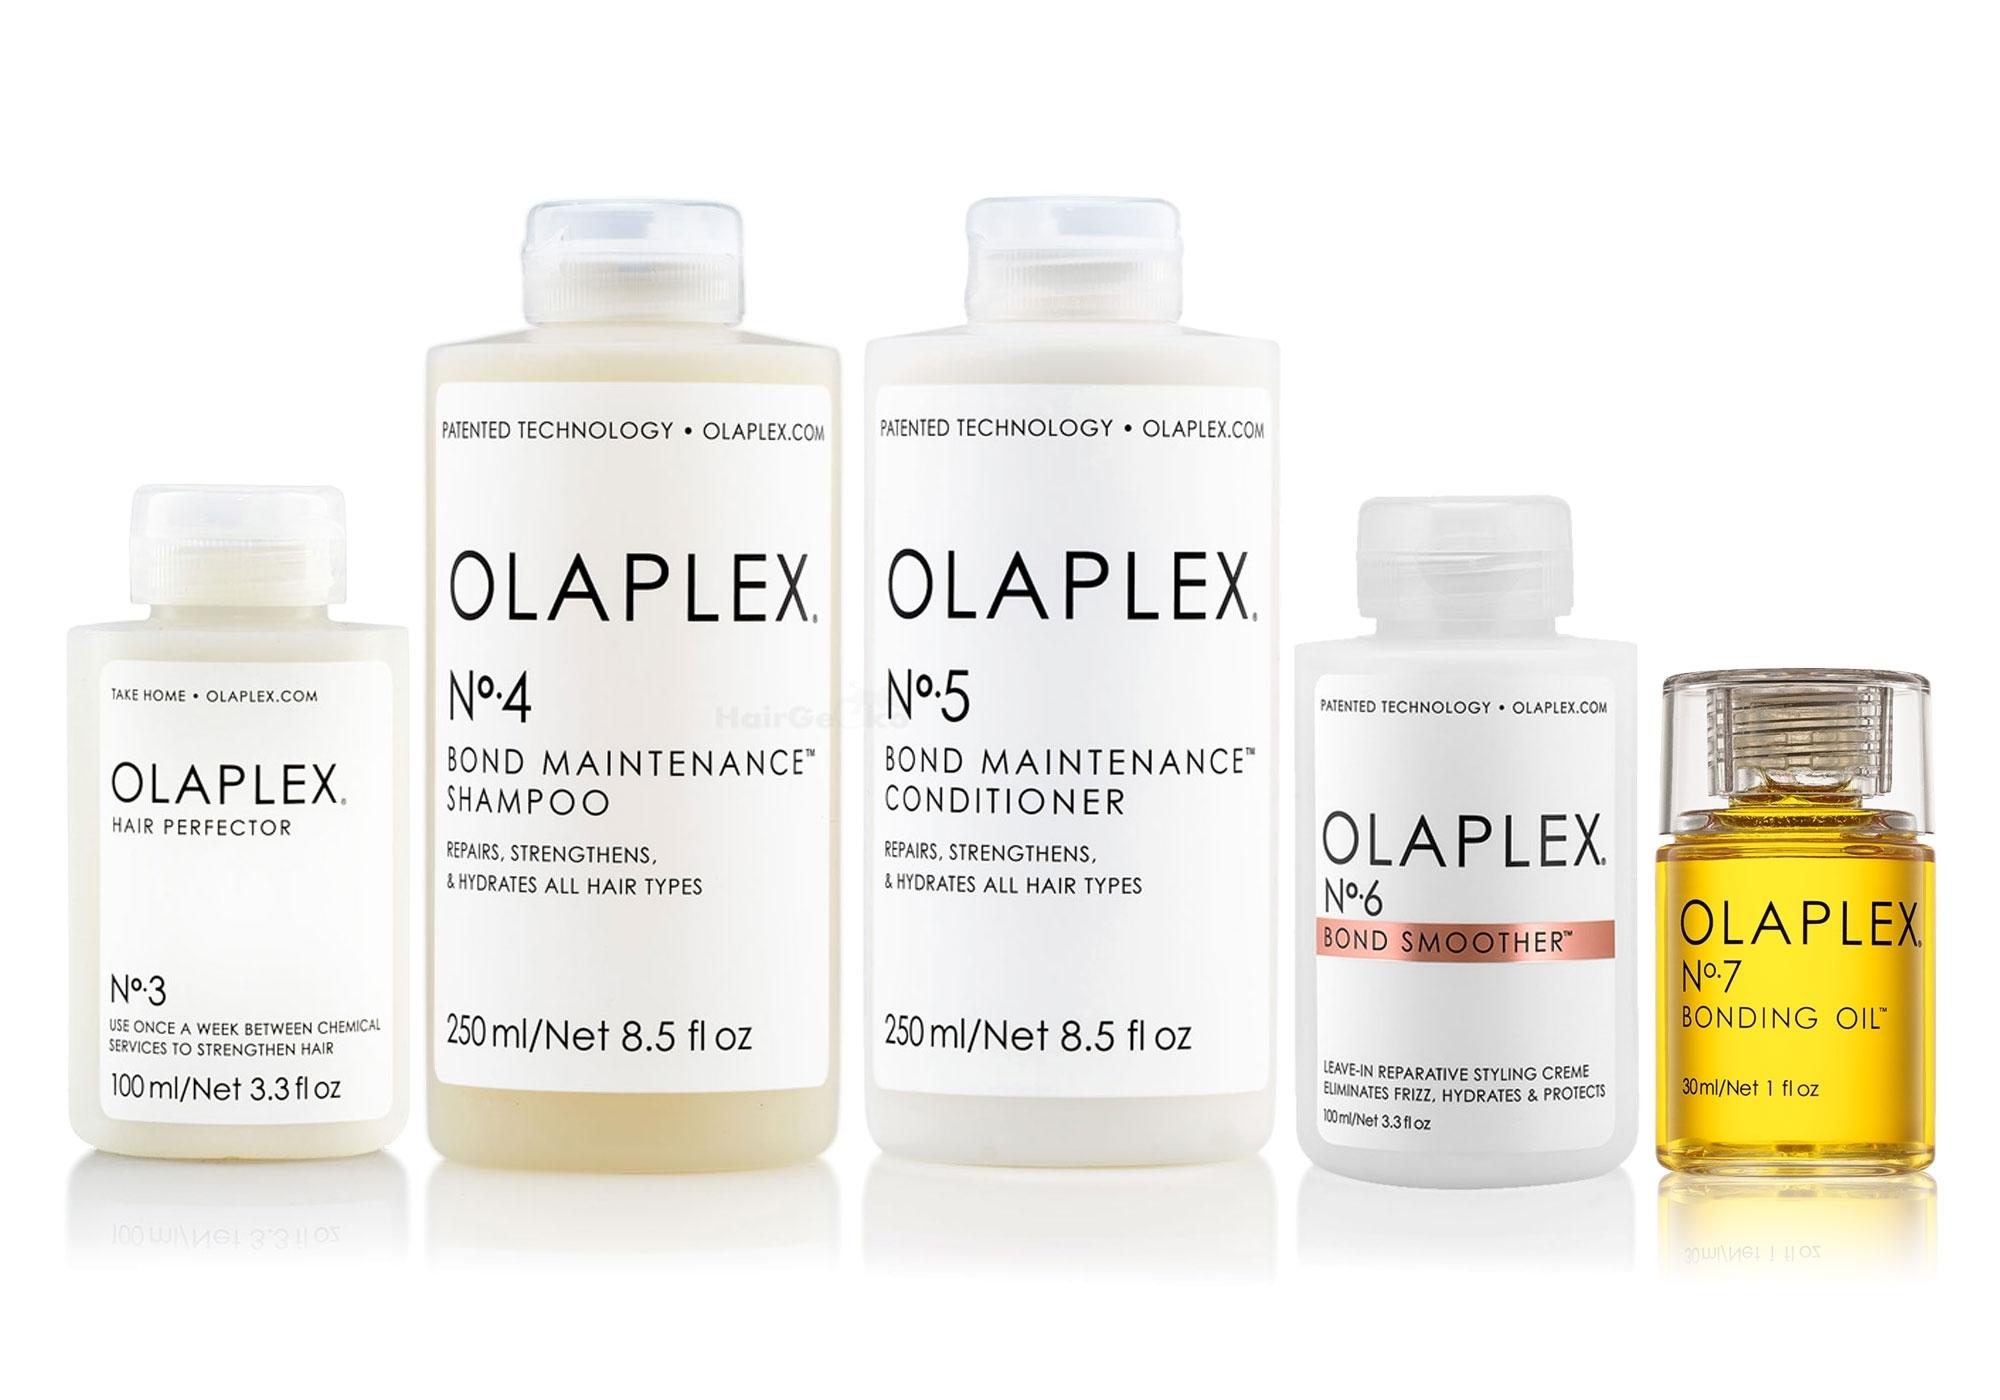 Olaplex Set - Olaplex Bond Maintenance Shampoo No 4 (250ml) + Olaplex Bond Maintenance Conditioner No 5 (250ml) + Olaplex Hair Perfector No 3 (100ml) + Olaplex Bond Smoother No 6 (100ml) + Olaplex Bonding Oil No 7 (30ml